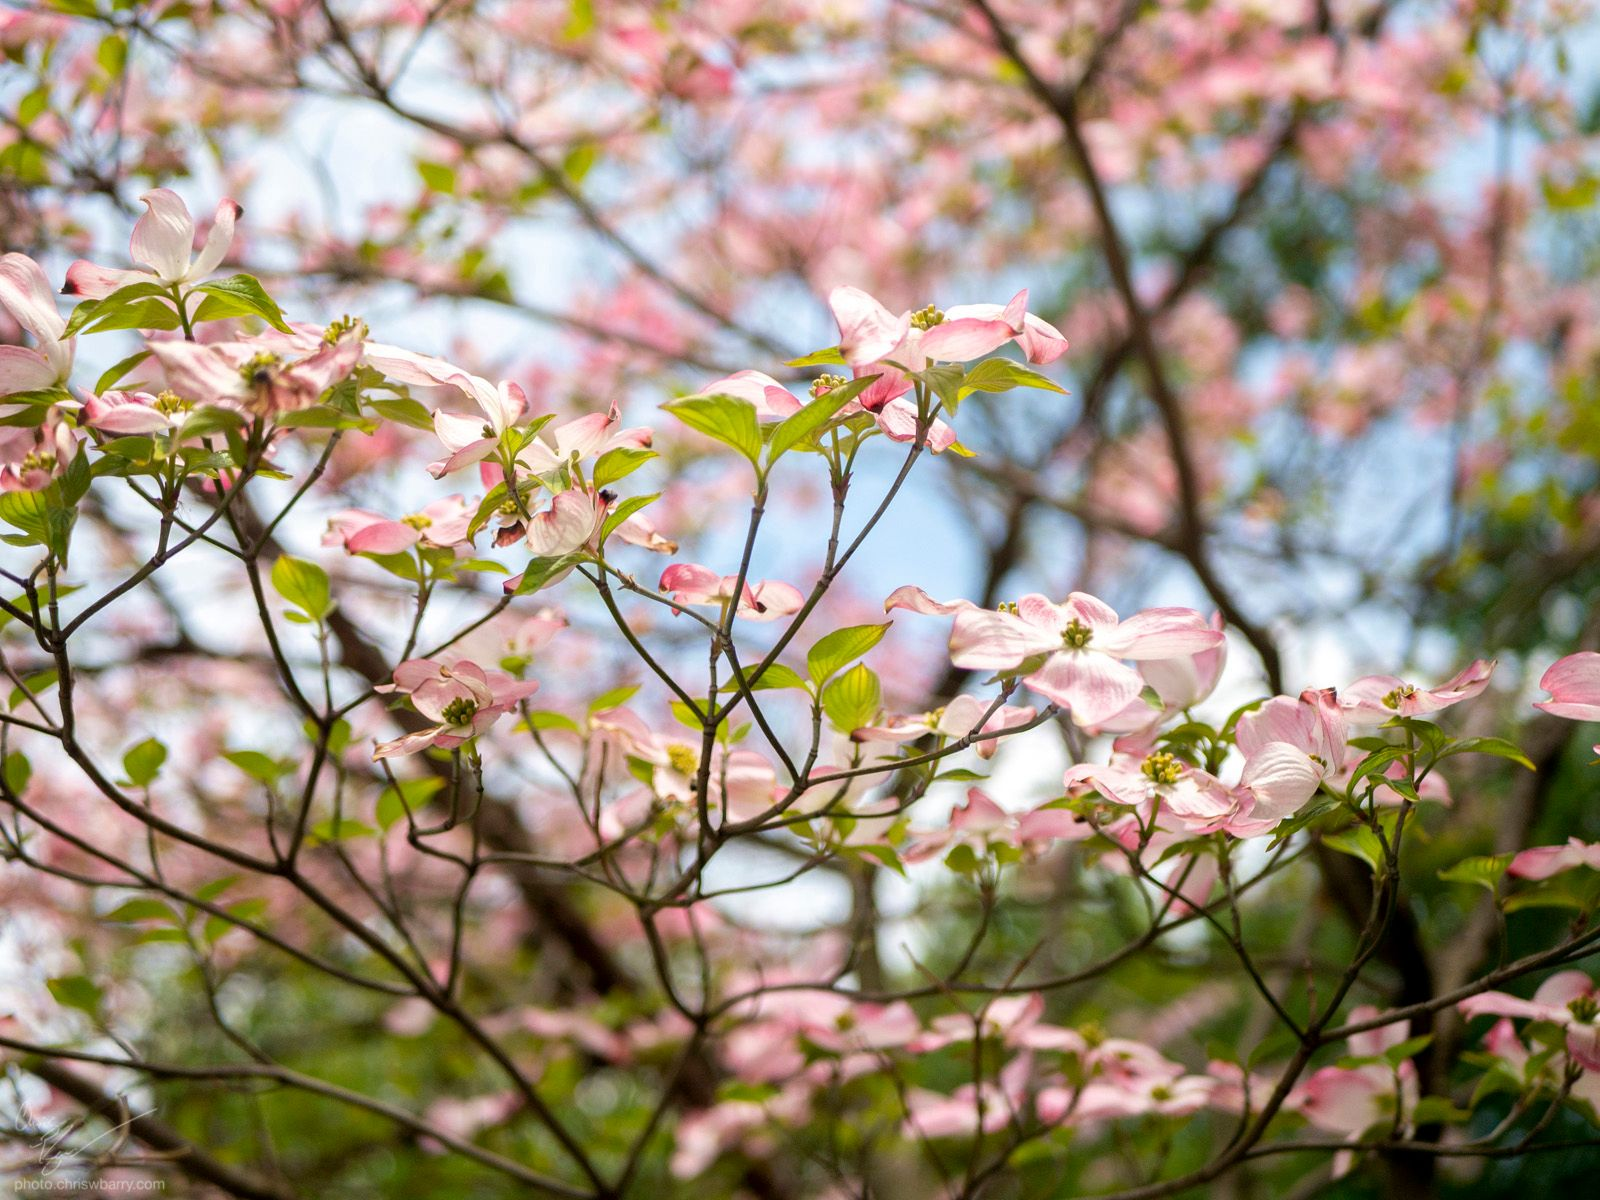 5-3-20: Pink Dogwood